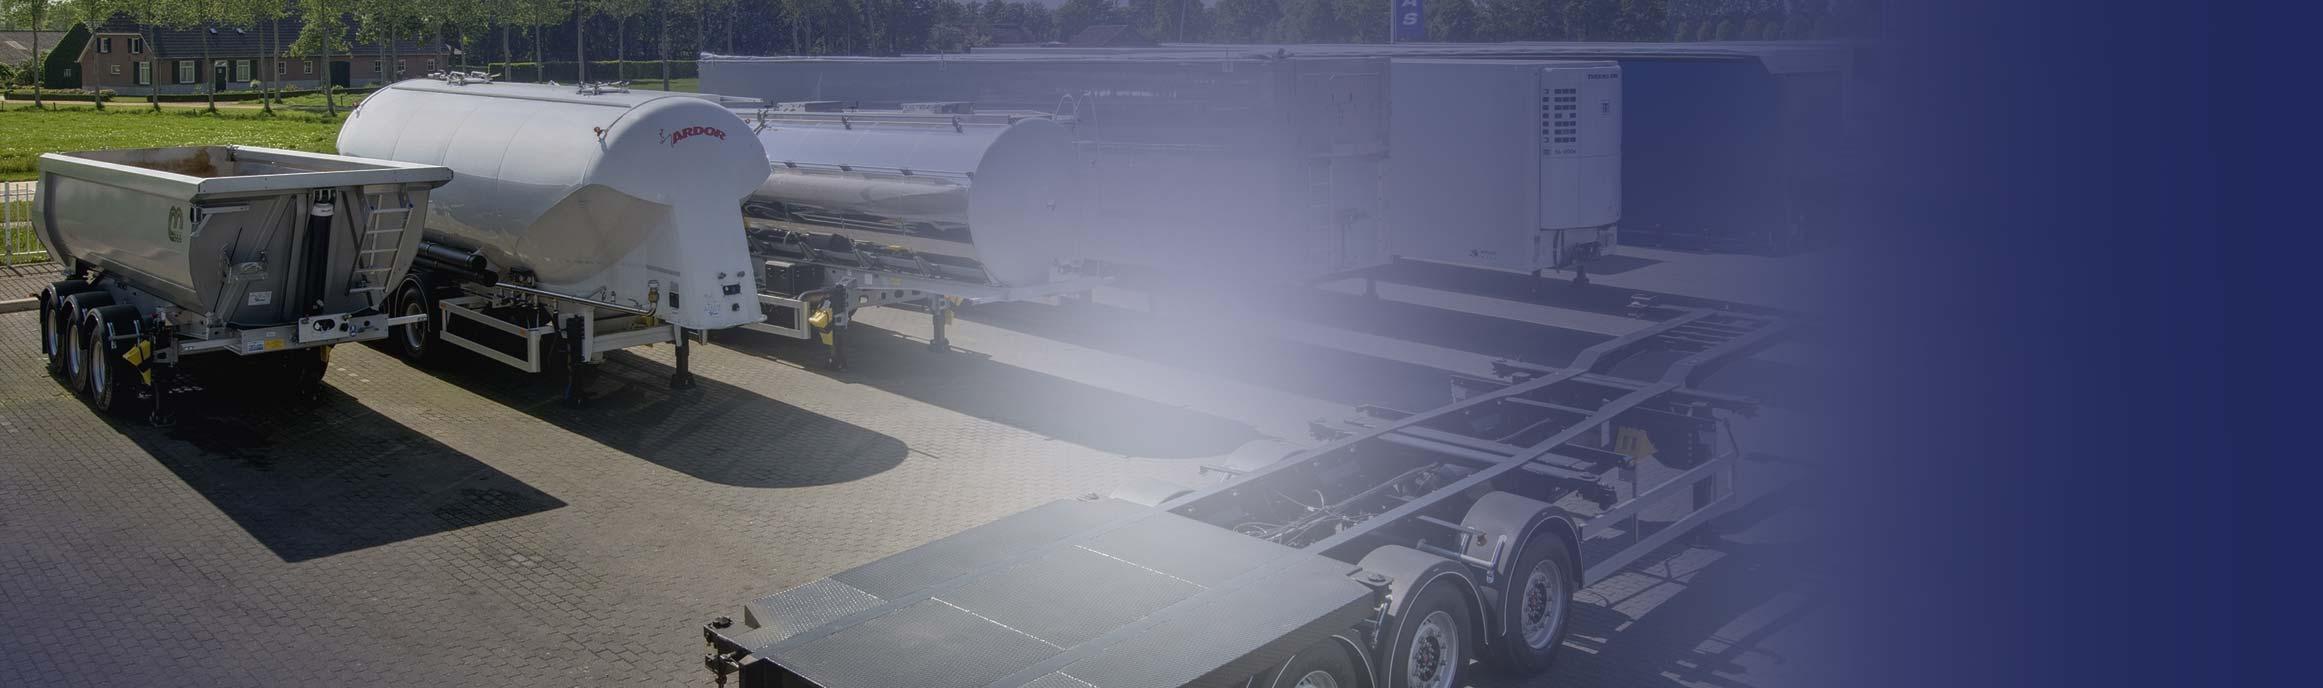 BAS Truck Center Trailers